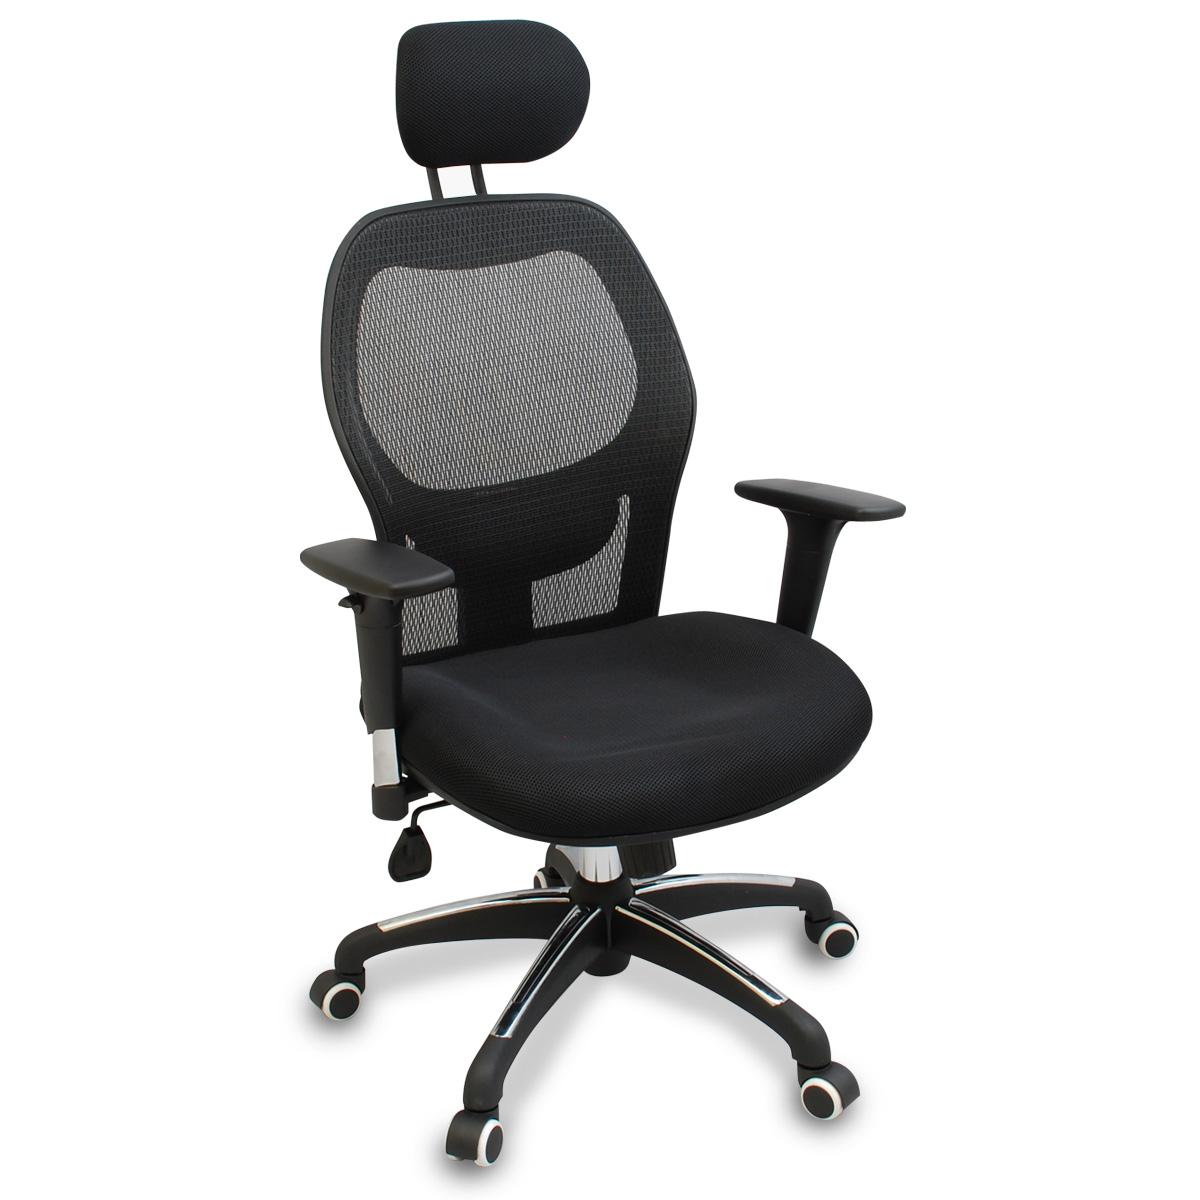 New Mesh Ergonomic Office Chair w/ Adjustable Headrest ...